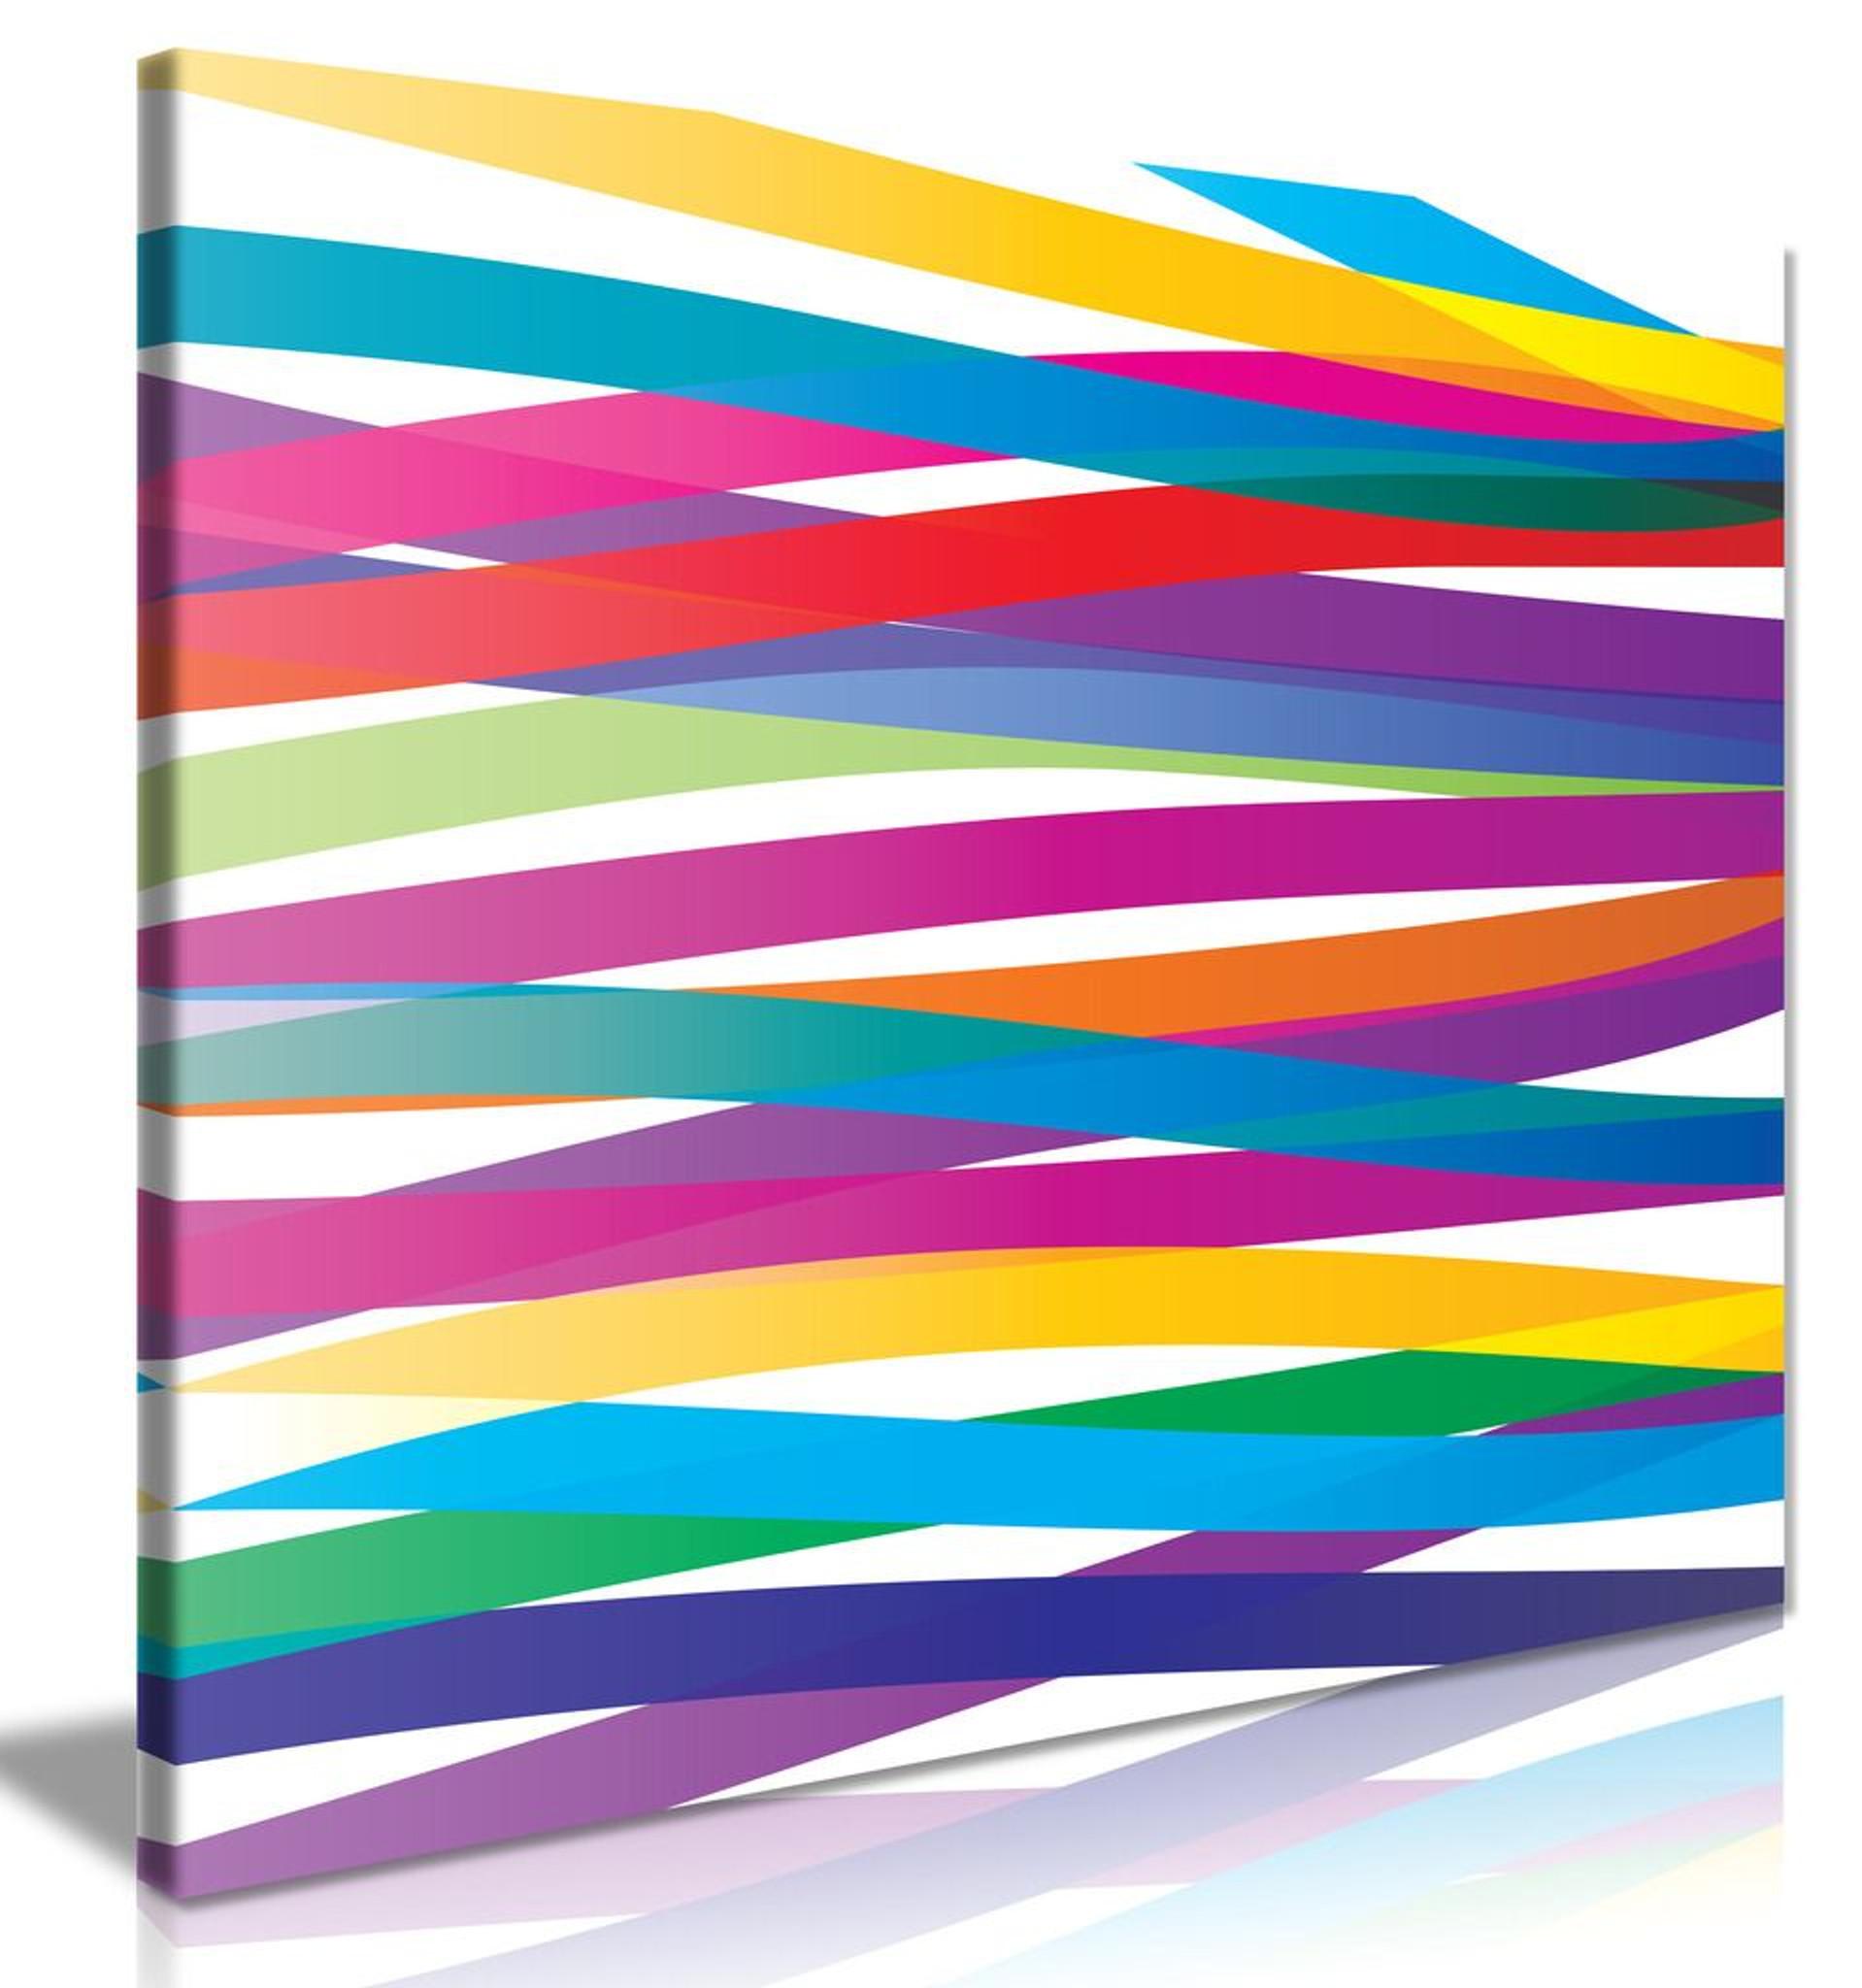 Abstract Modern Art Vivid Colourful Ribbons Canvas